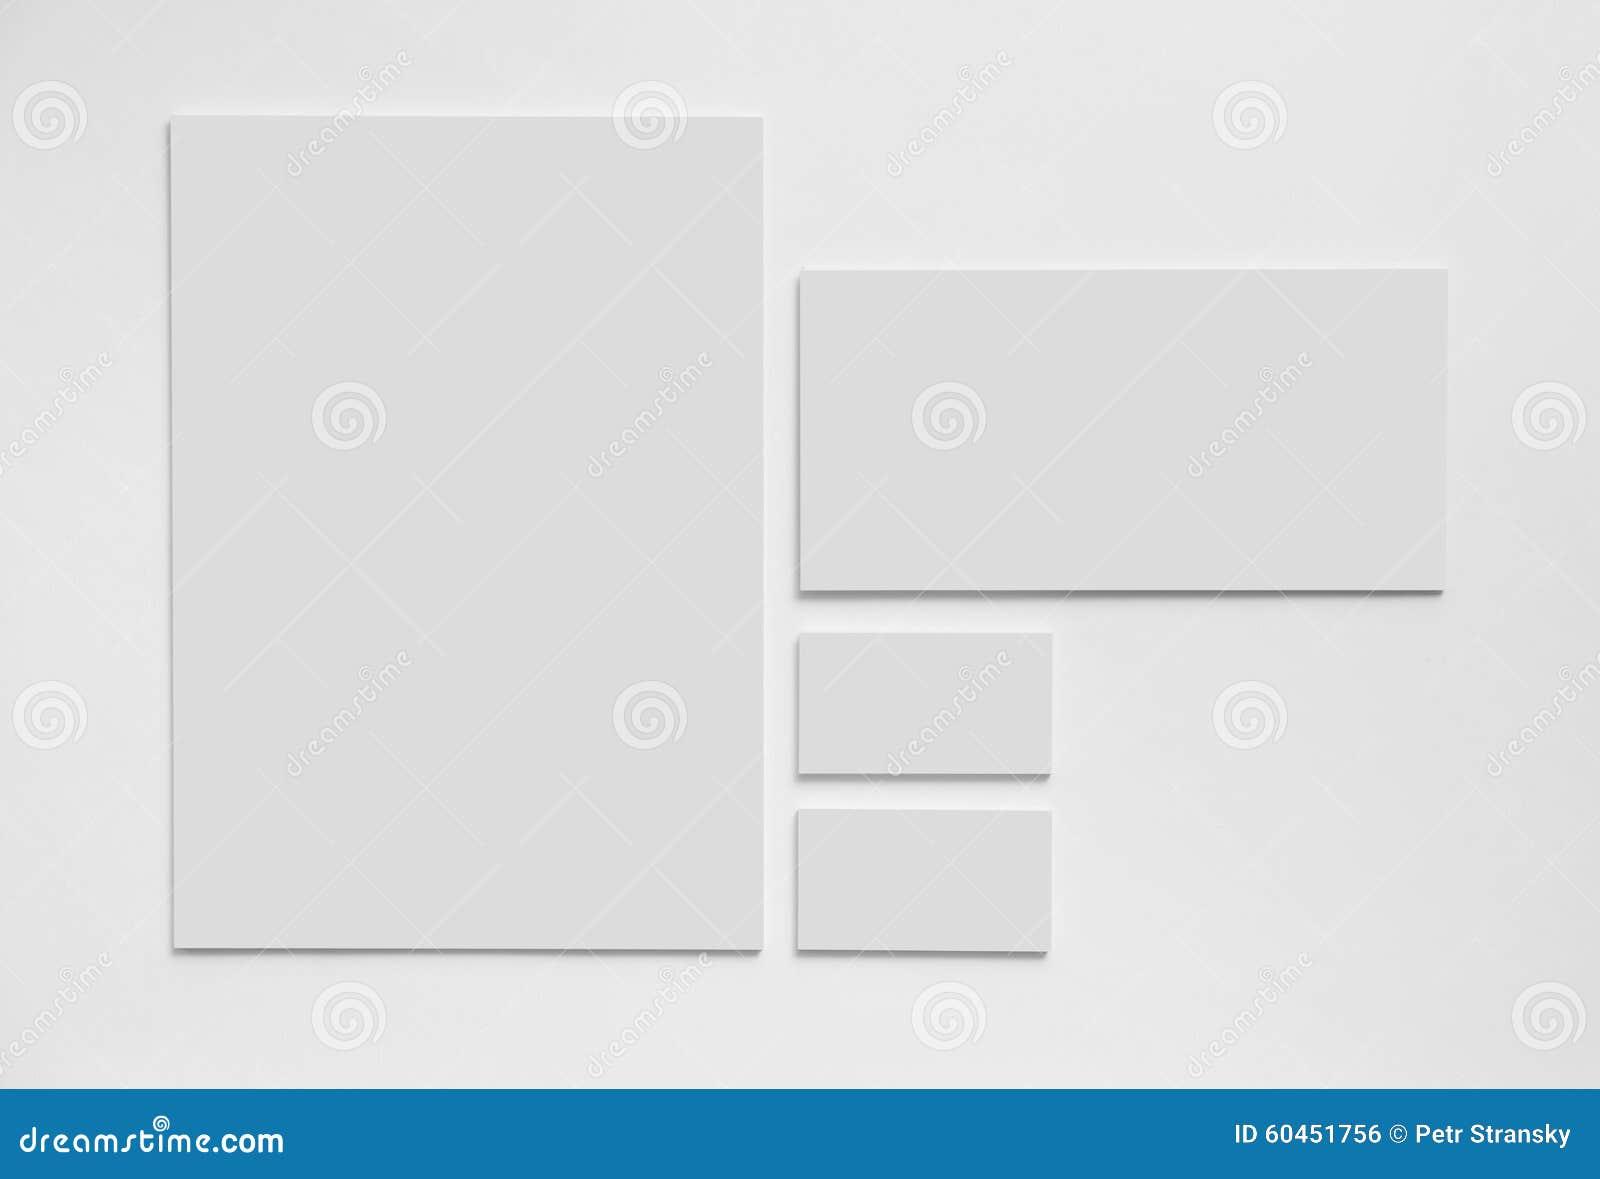 business plan op 1 a4 format envelope